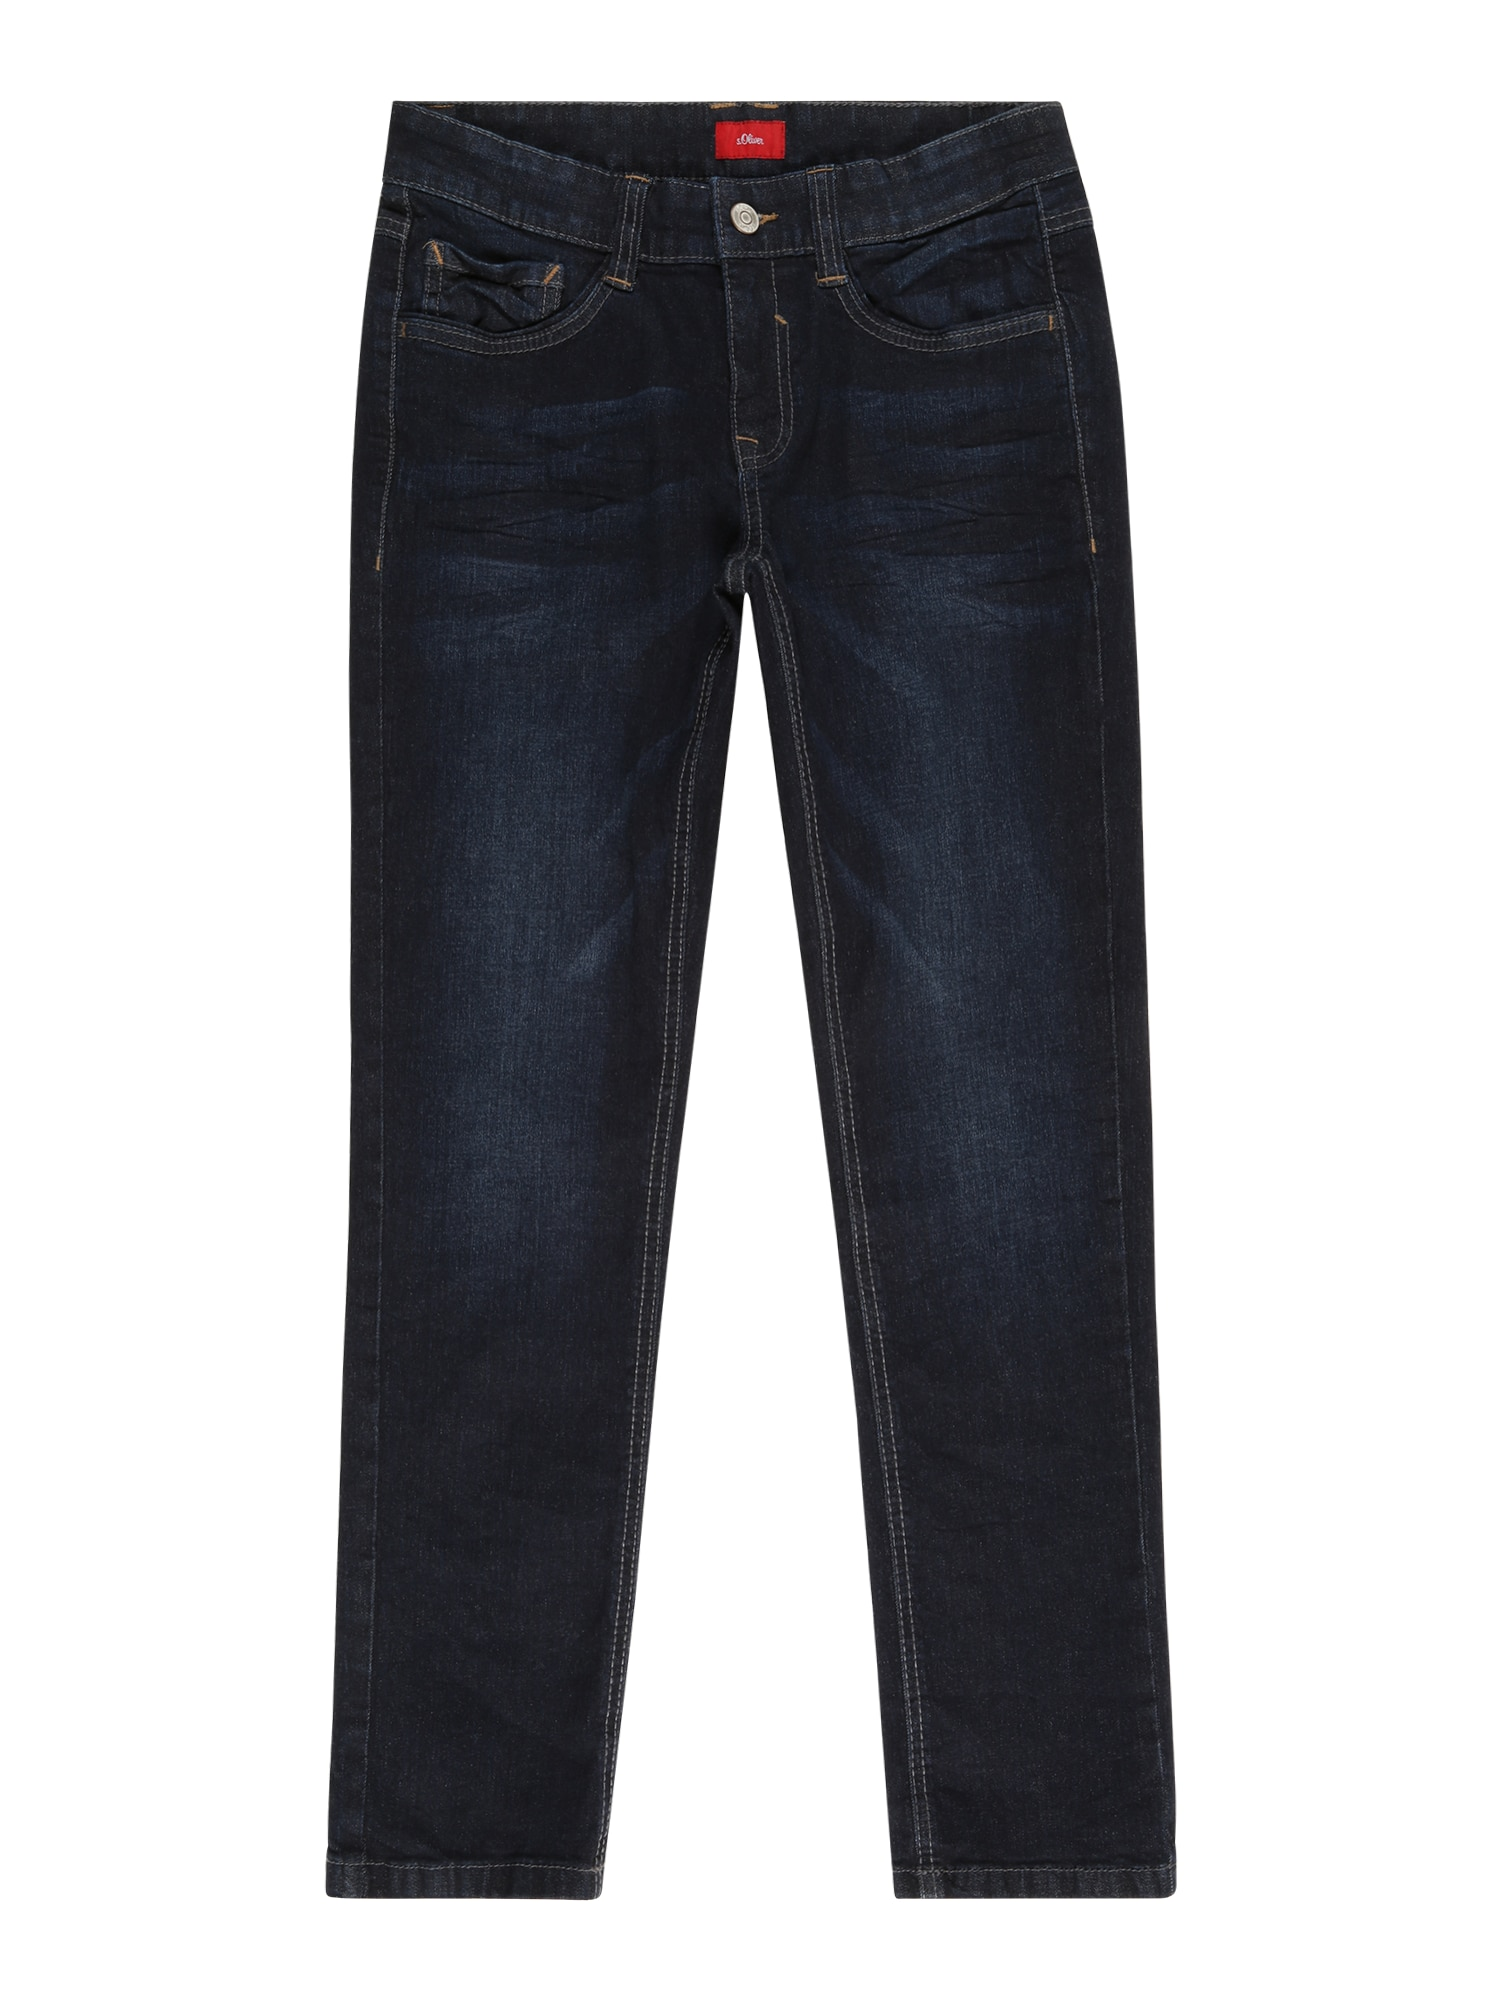 s.Oliver Junior Džinsai tamsiai (džinso) mėlyna